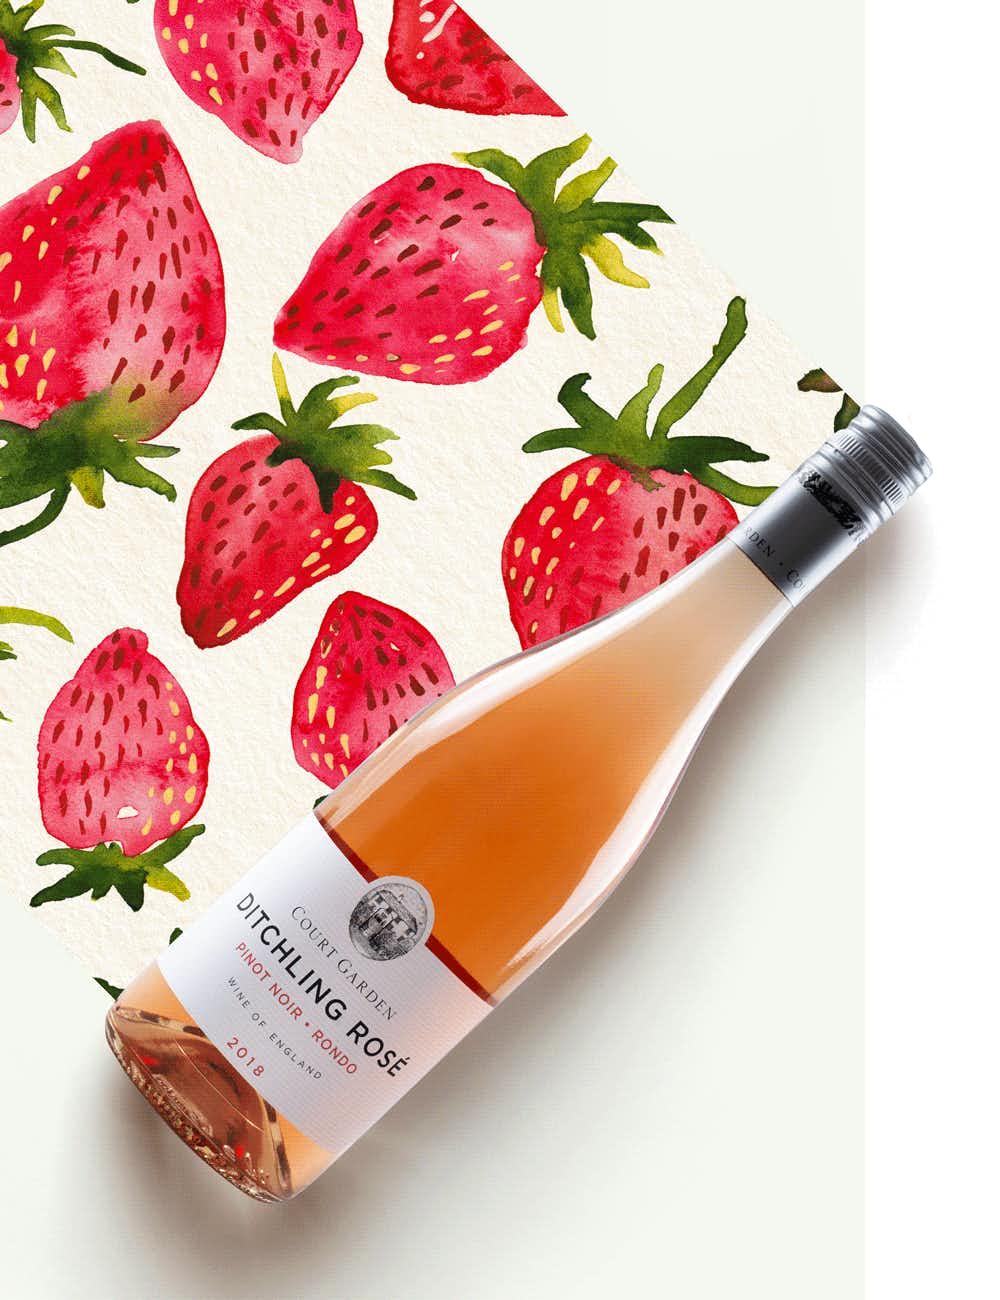 Court Garden VineyardDitchling Rosé 2018